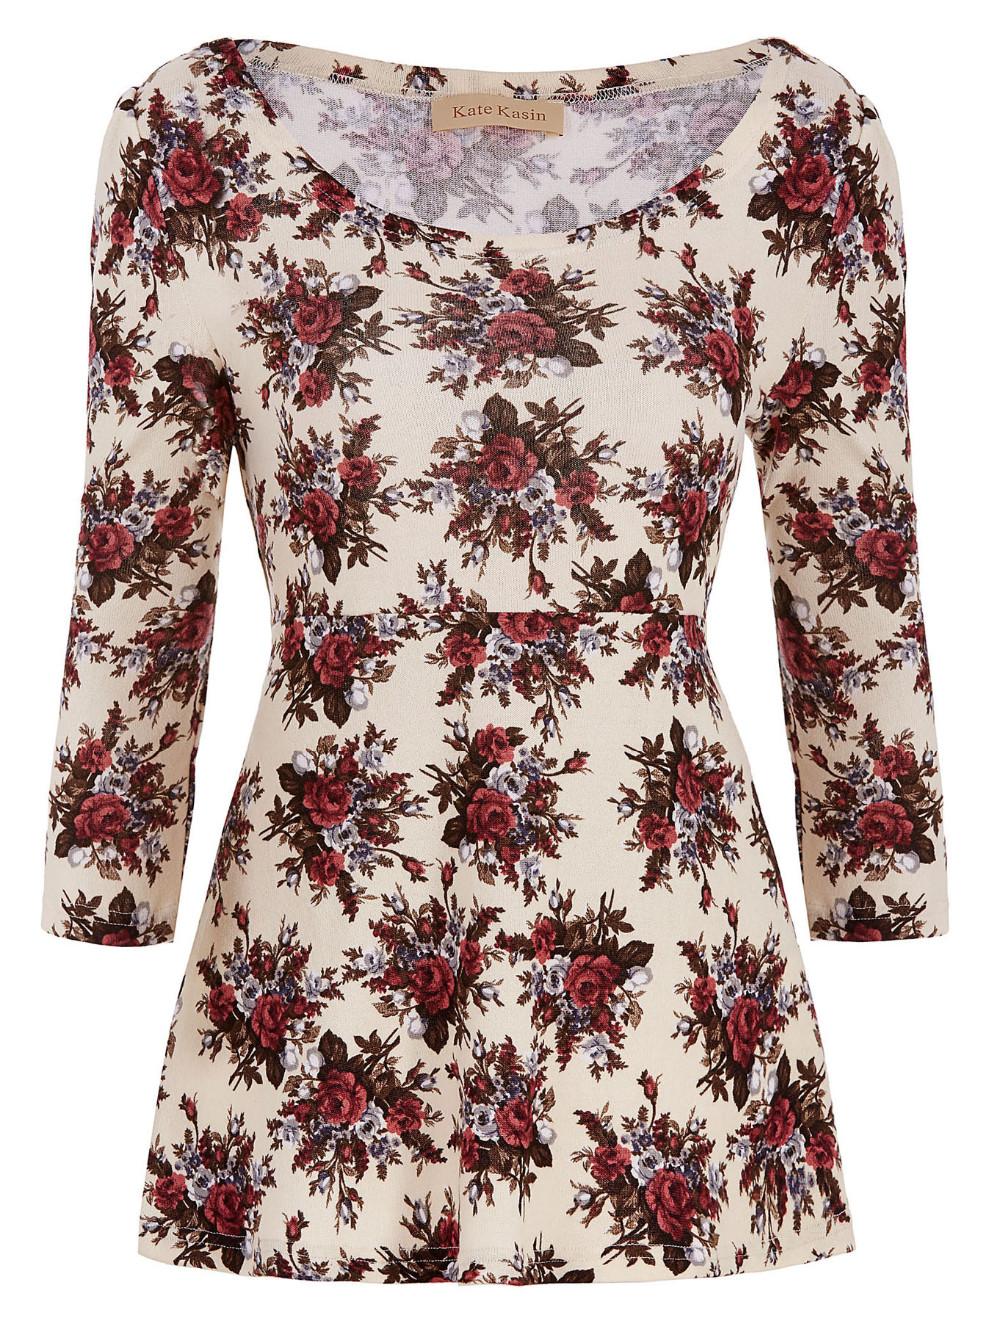 Floral ocasional camiseta mujeres o Masajeadores de cuello 3 4 manga tamaño  grande mujer ropa retro camiseta vintage 2016 Mujer tops c8bfa23b13d8d